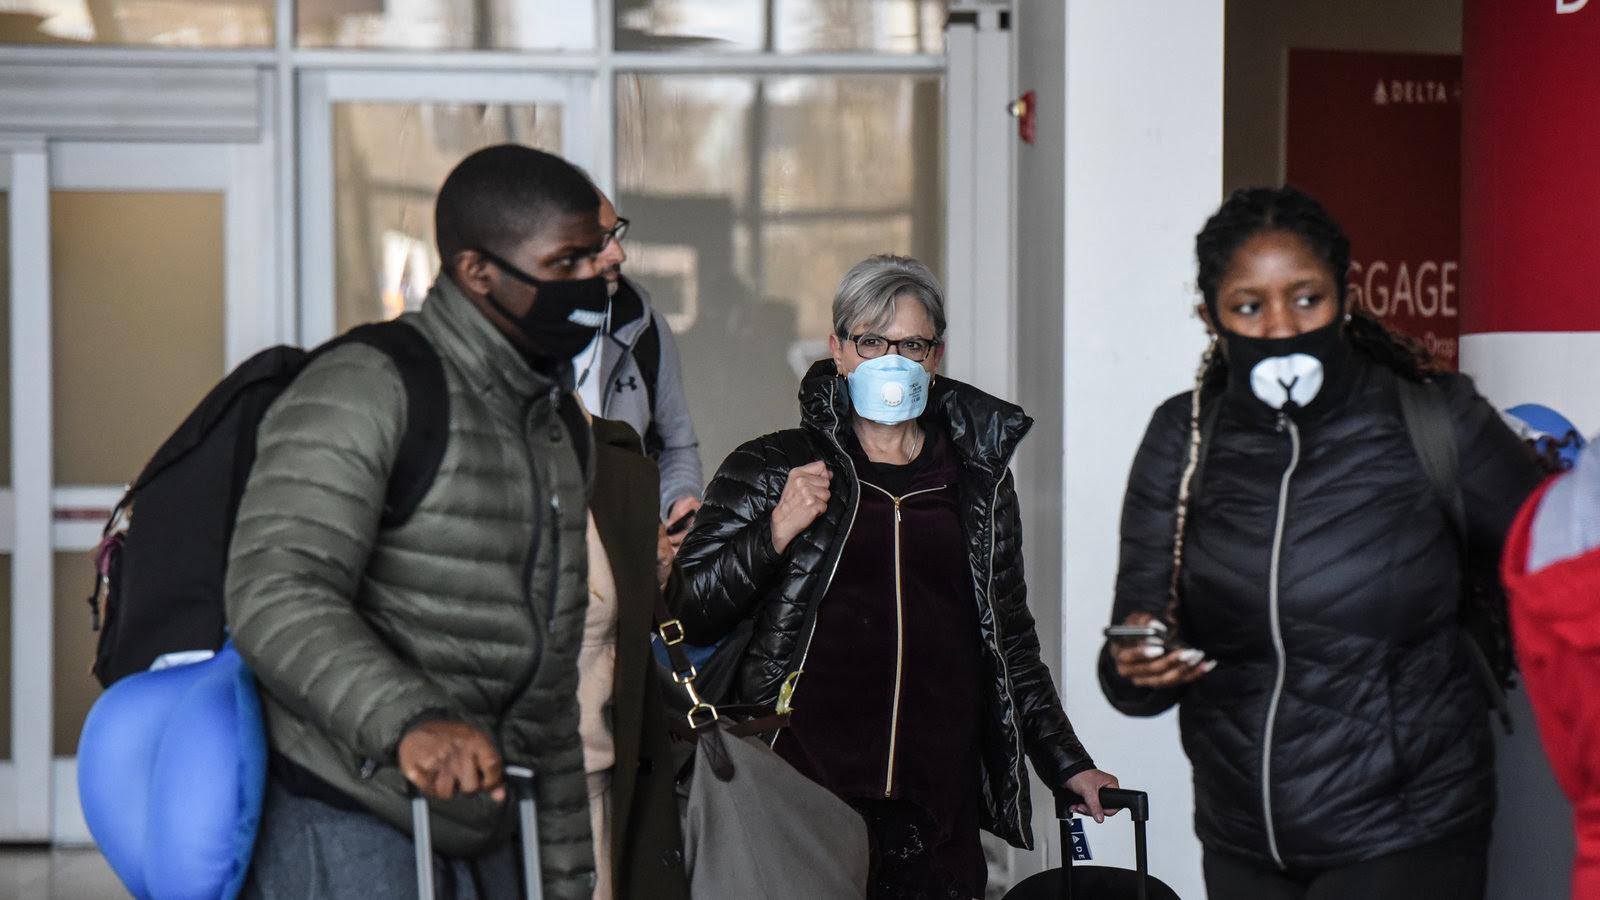 The Coronavirus Mask Charade Continues ?u=https%3A%2F%2Fstatic01.nyt.com%2Fimages%2F2020%2F02%2F29%2Fus%2F29xp-mask%2F29xp-mask-videoSixteenByNineJumbo1600